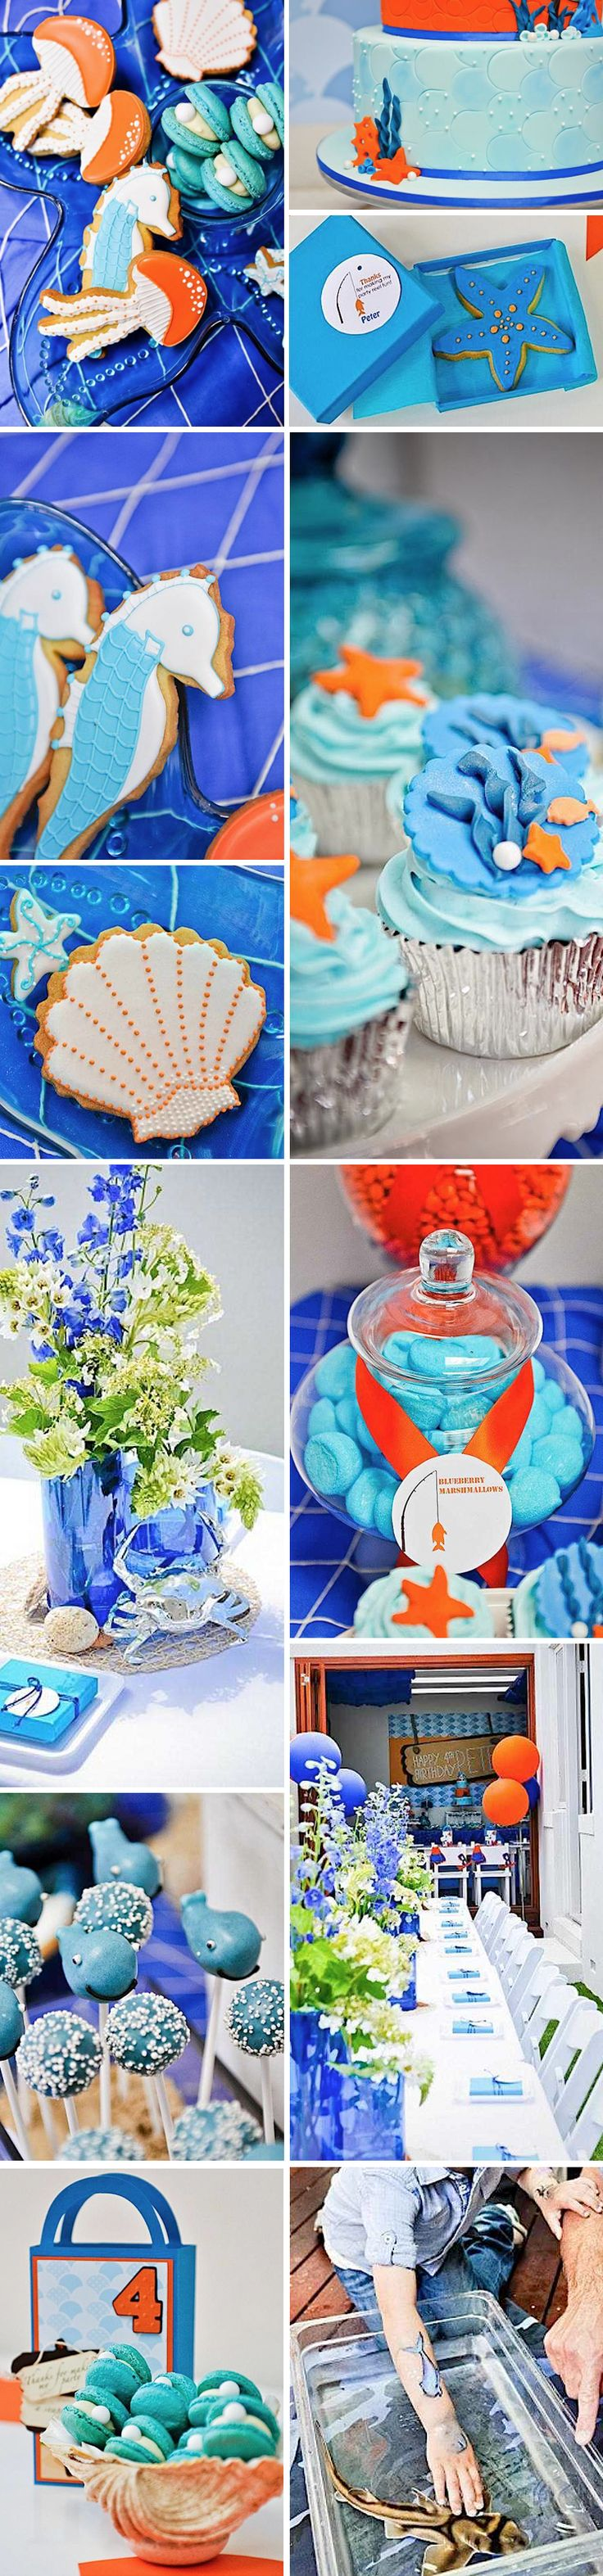 145 best birthday party ideas images on Pinterest Auburn cake